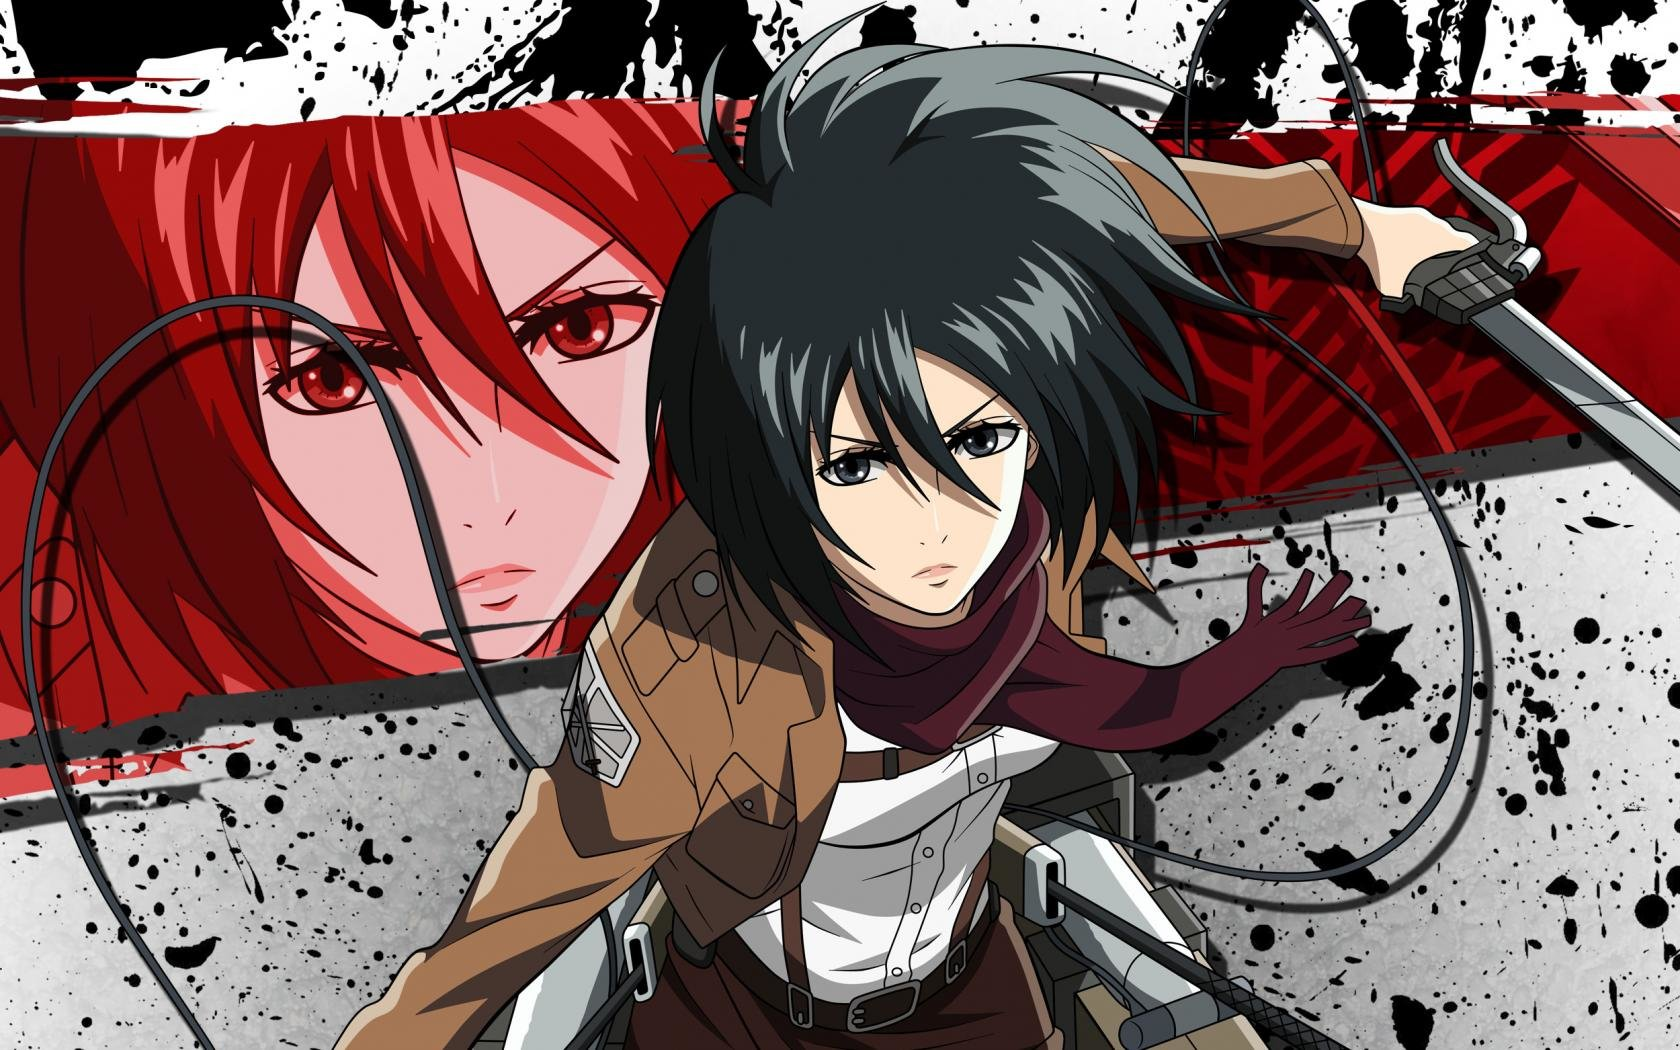 Shingeki no kyojin hd wallpapers free download. Mikasa Ackerman wallpapers 1680x1050 desktop backgrounds